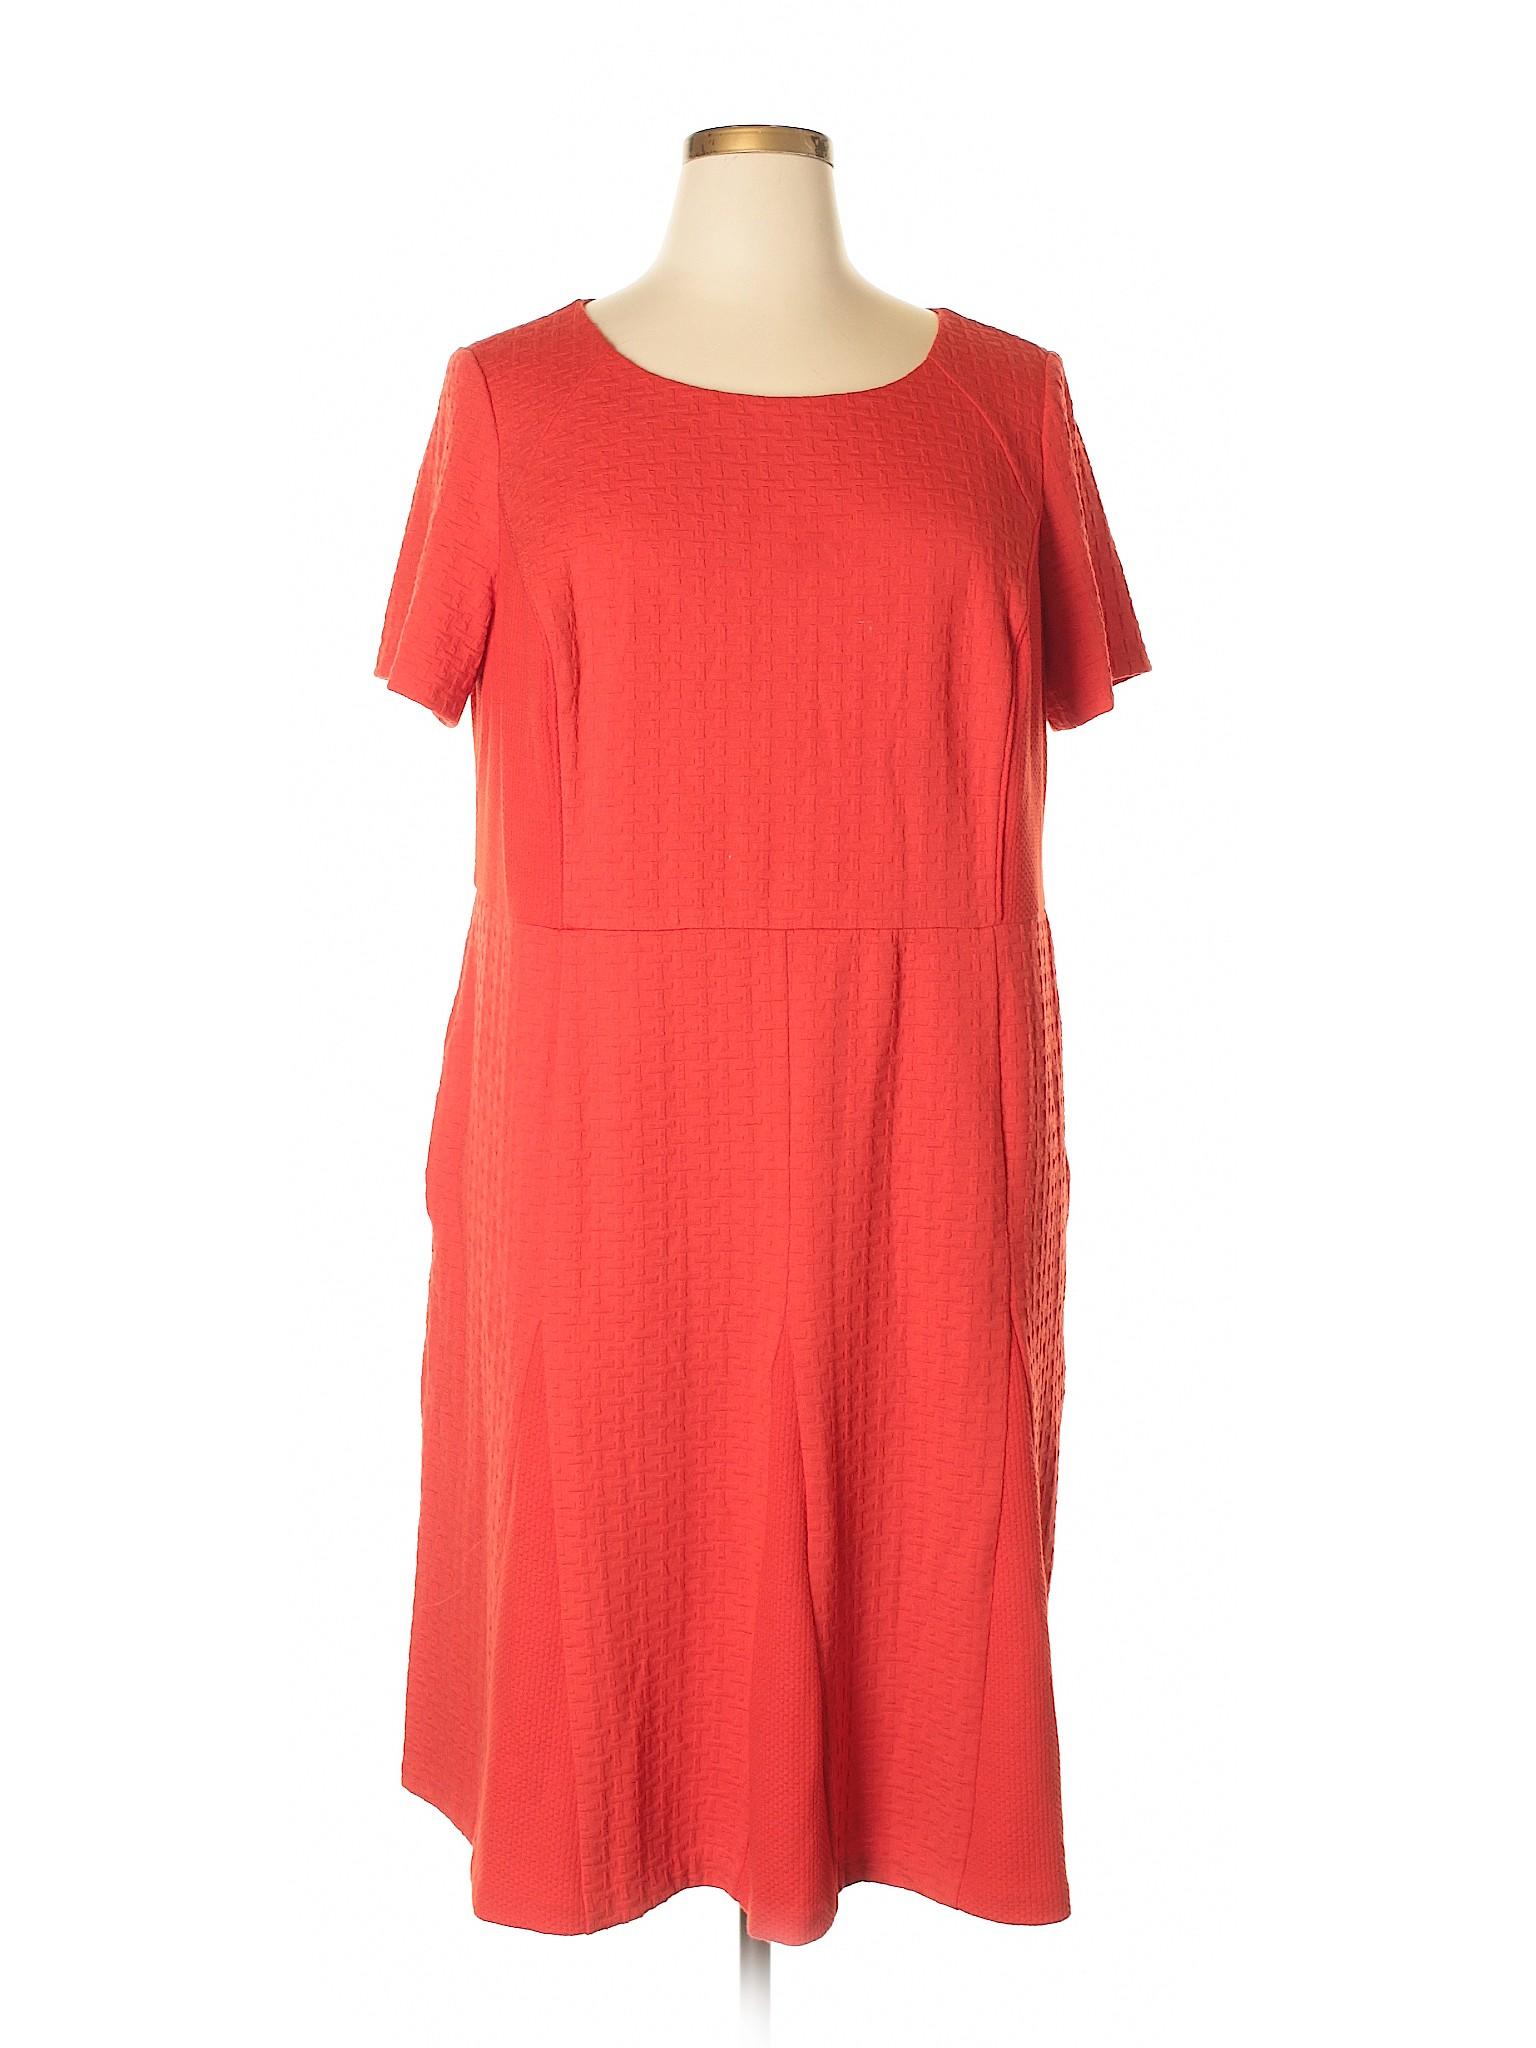 Talbots Casual Dress Selling Dress Selling Casual Talbots xqpnapIwHz